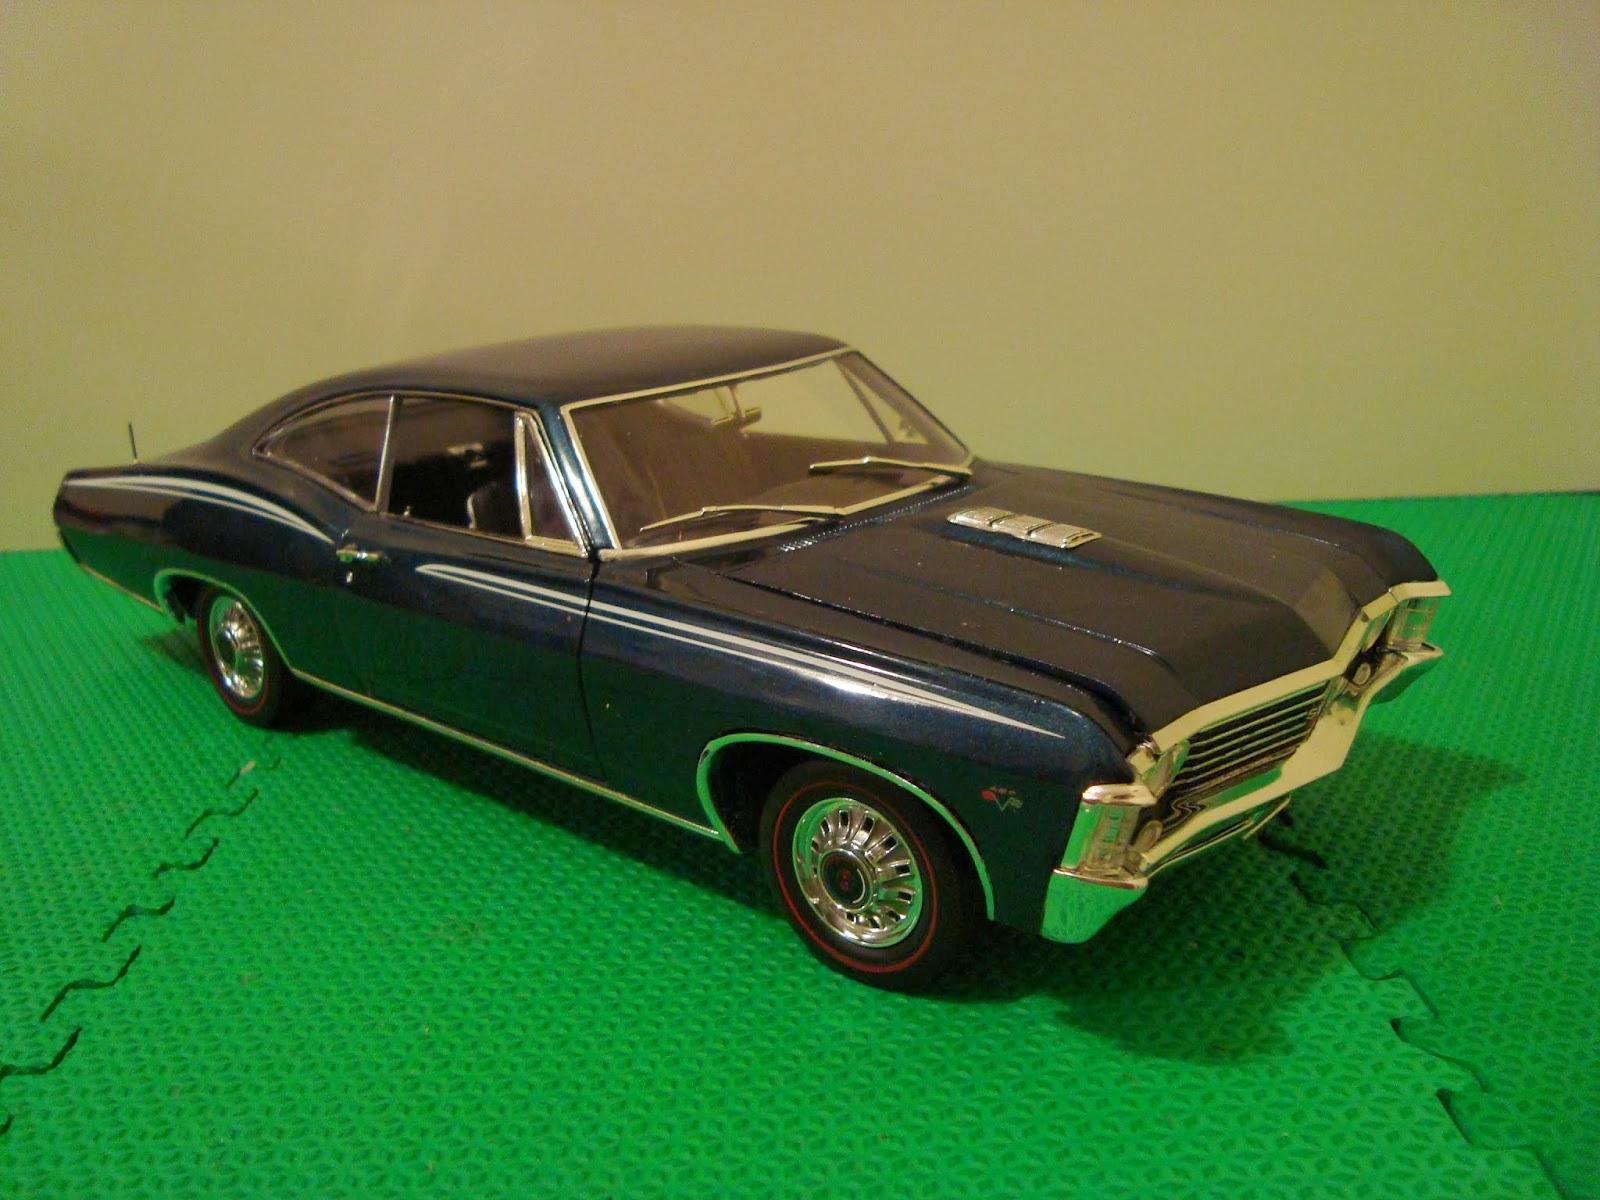 diecast american car nutz 1967 chevrolet impala ss. Black Bedroom Furniture Sets. Home Design Ideas